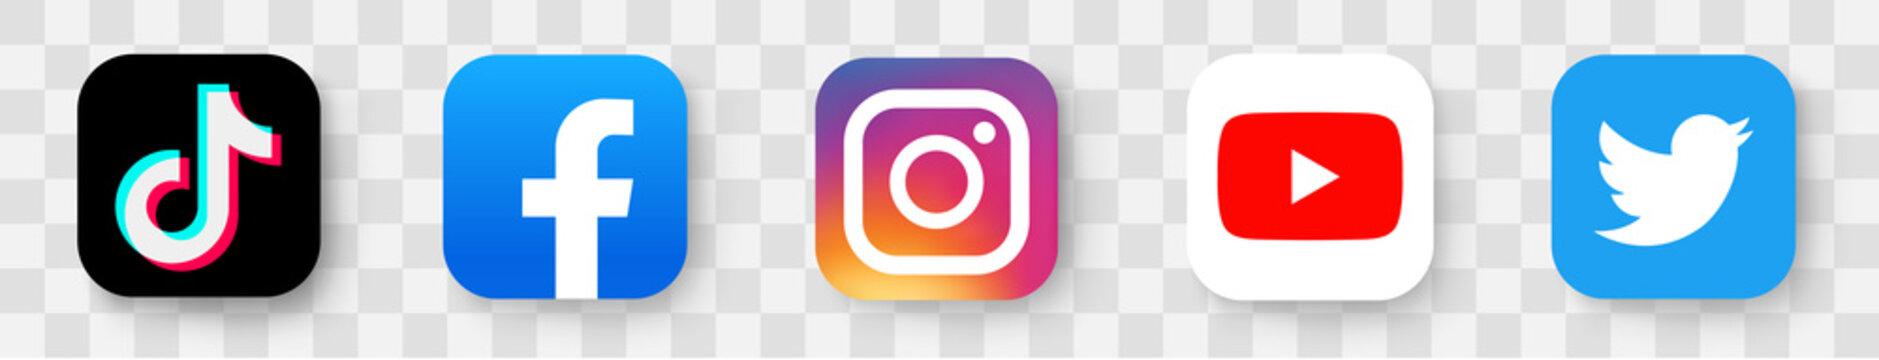 Realistic social media logotype collection: Tik Tok, facebook, instagram, twitter, youtube. Social media tiktok icons. - stock vector editorial.